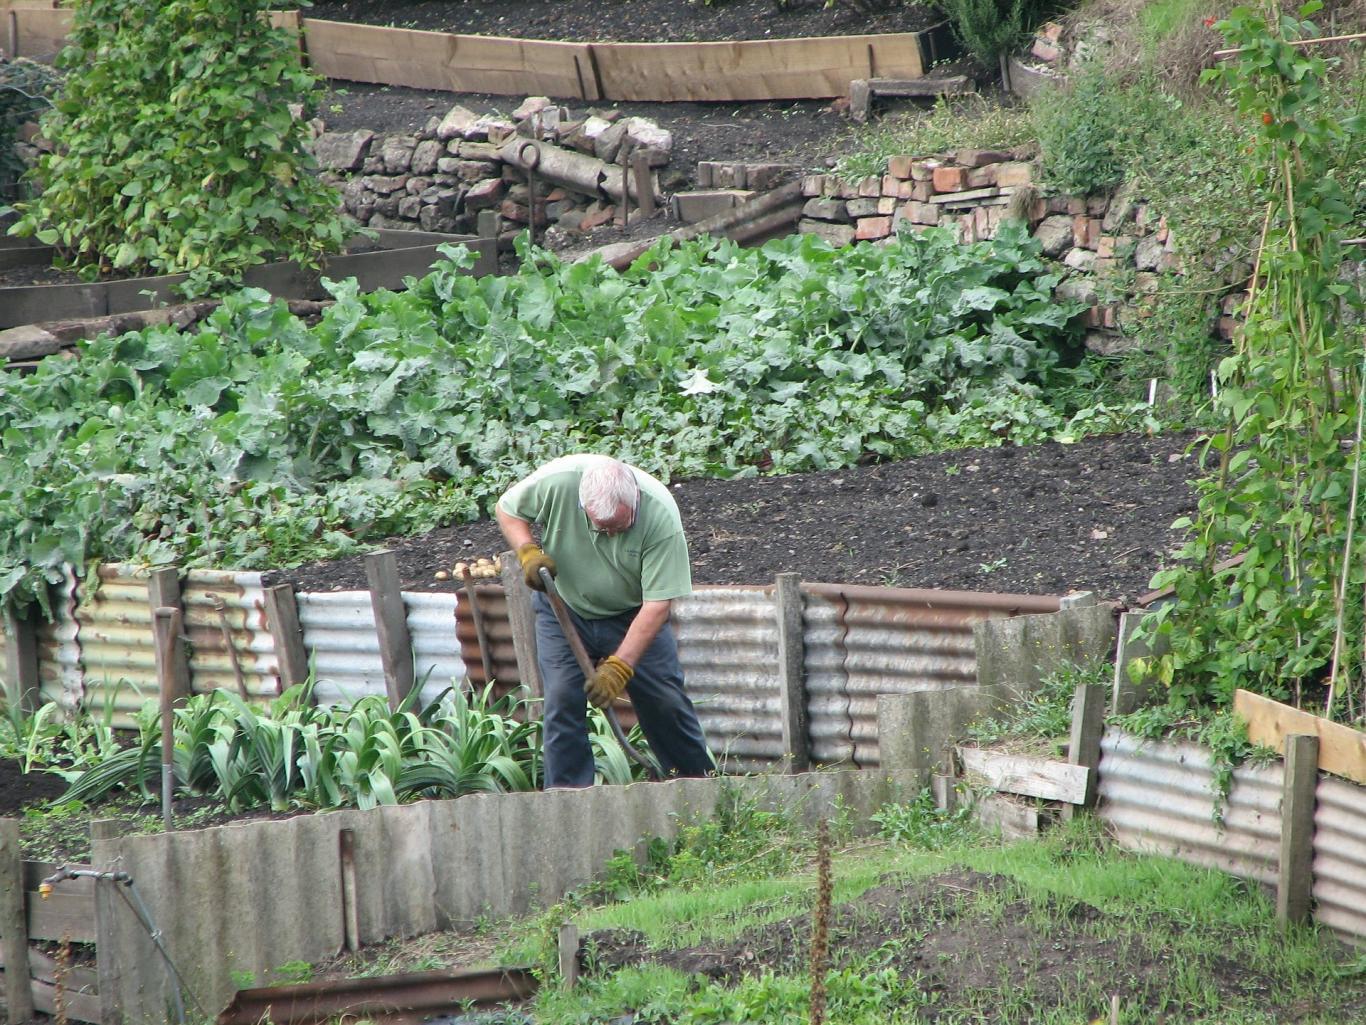 Jardinero cavando la tierra